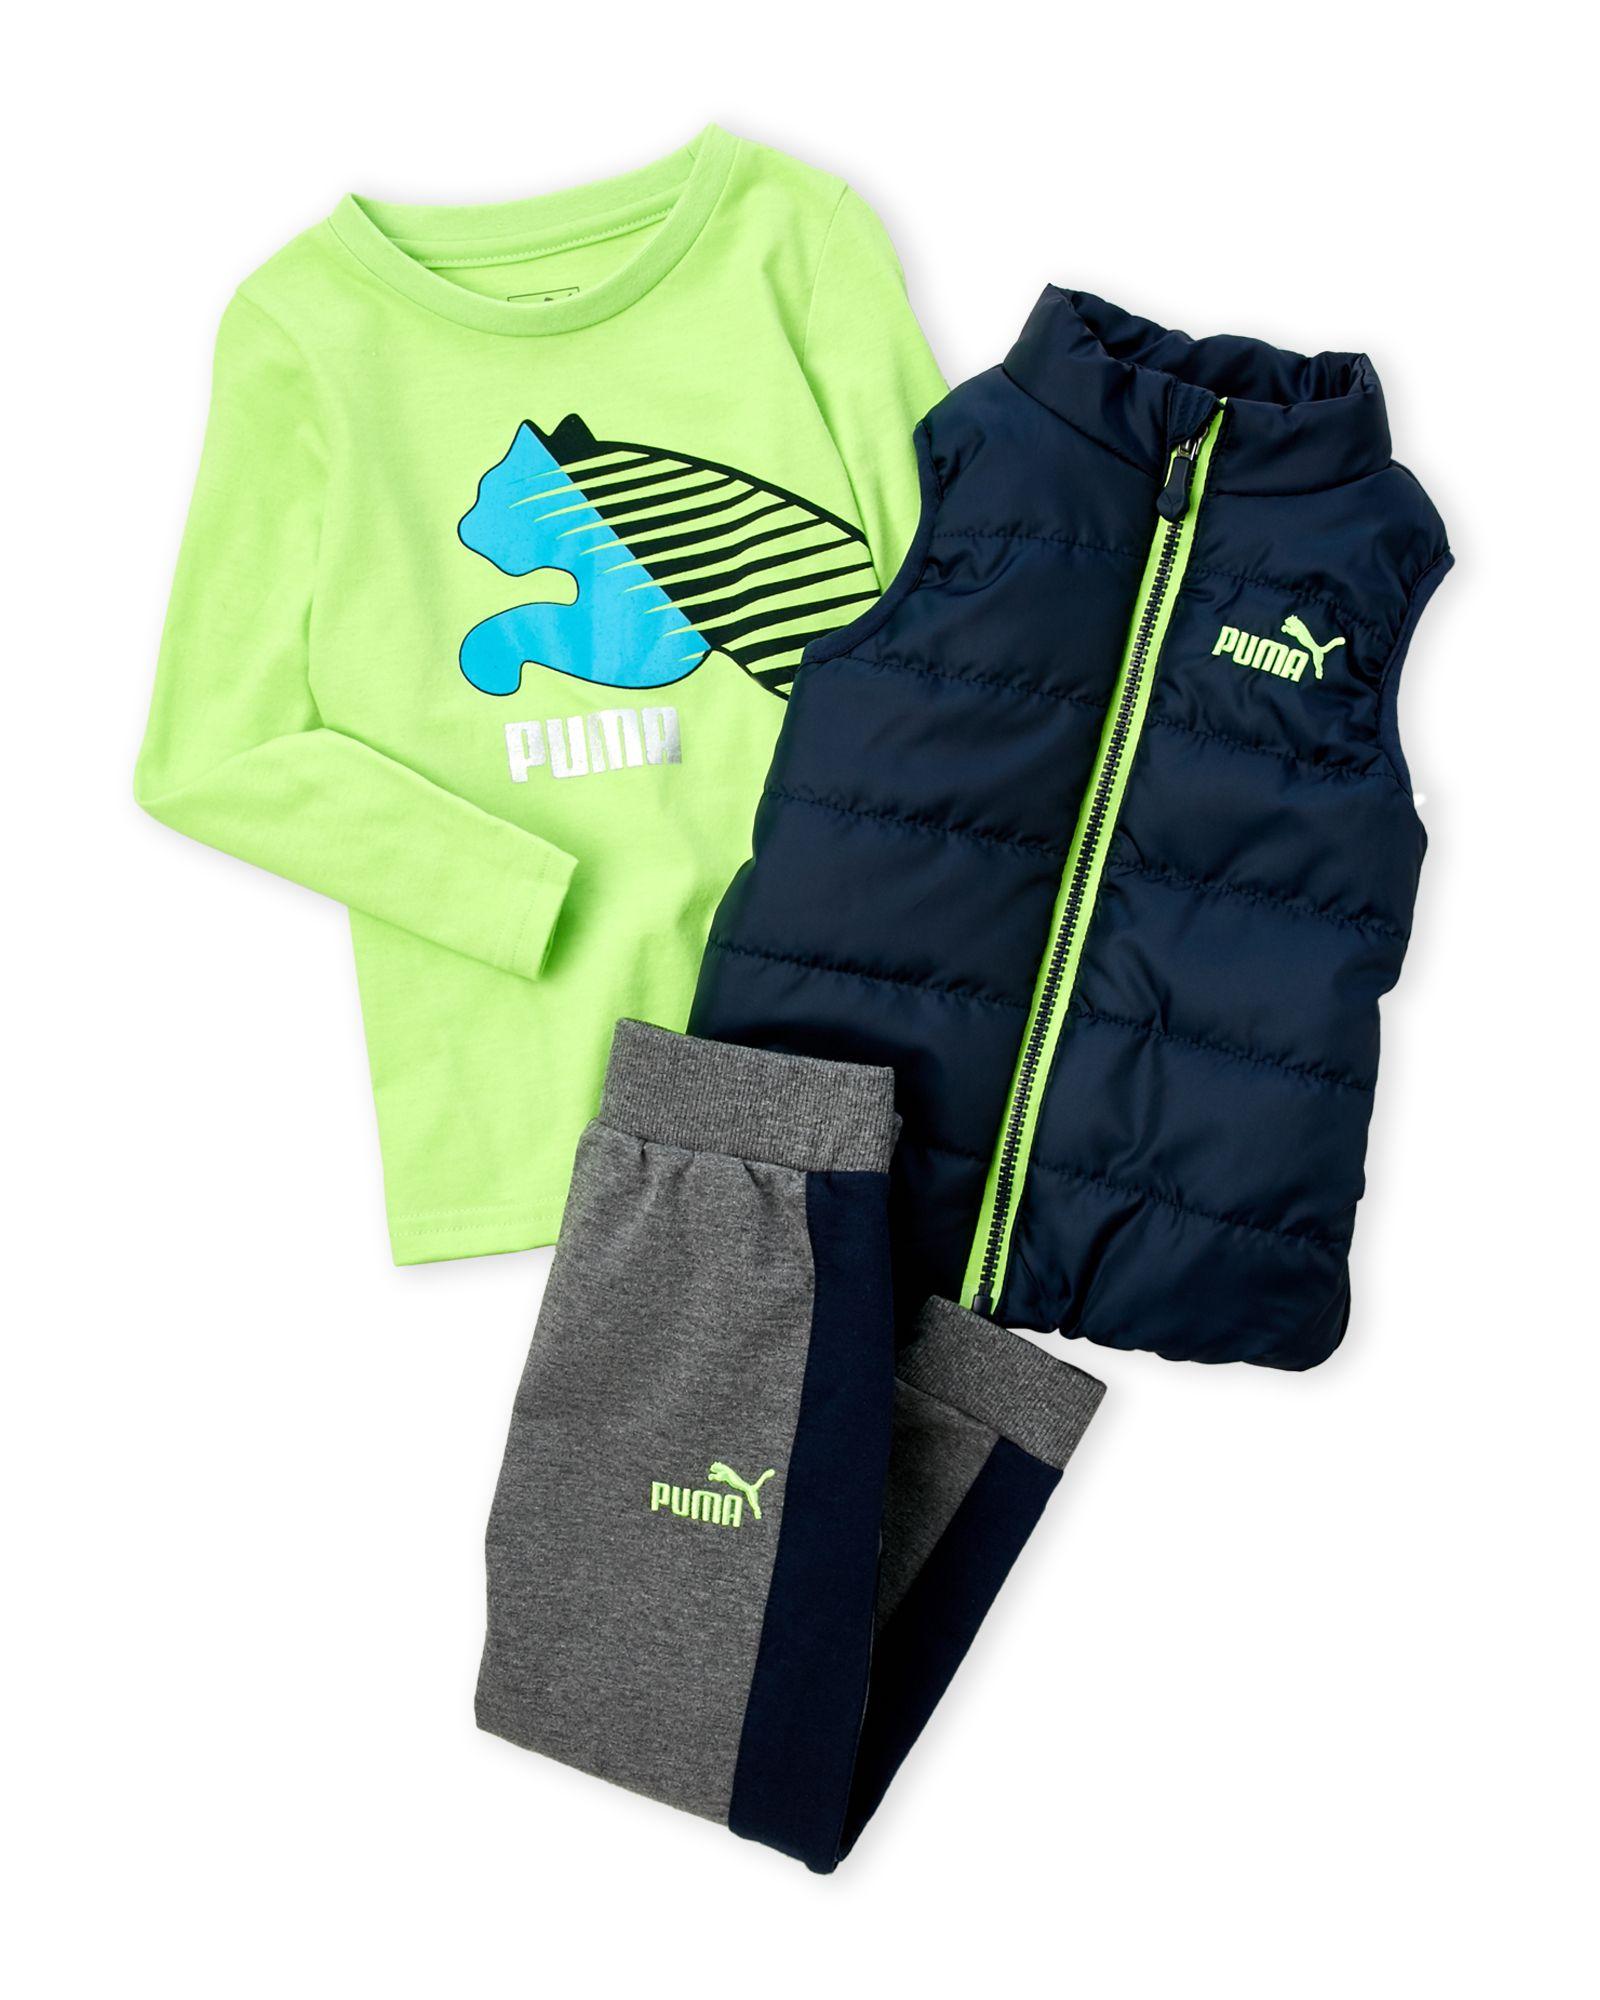 Puma Toddler Boys 3 Piece Vest Set